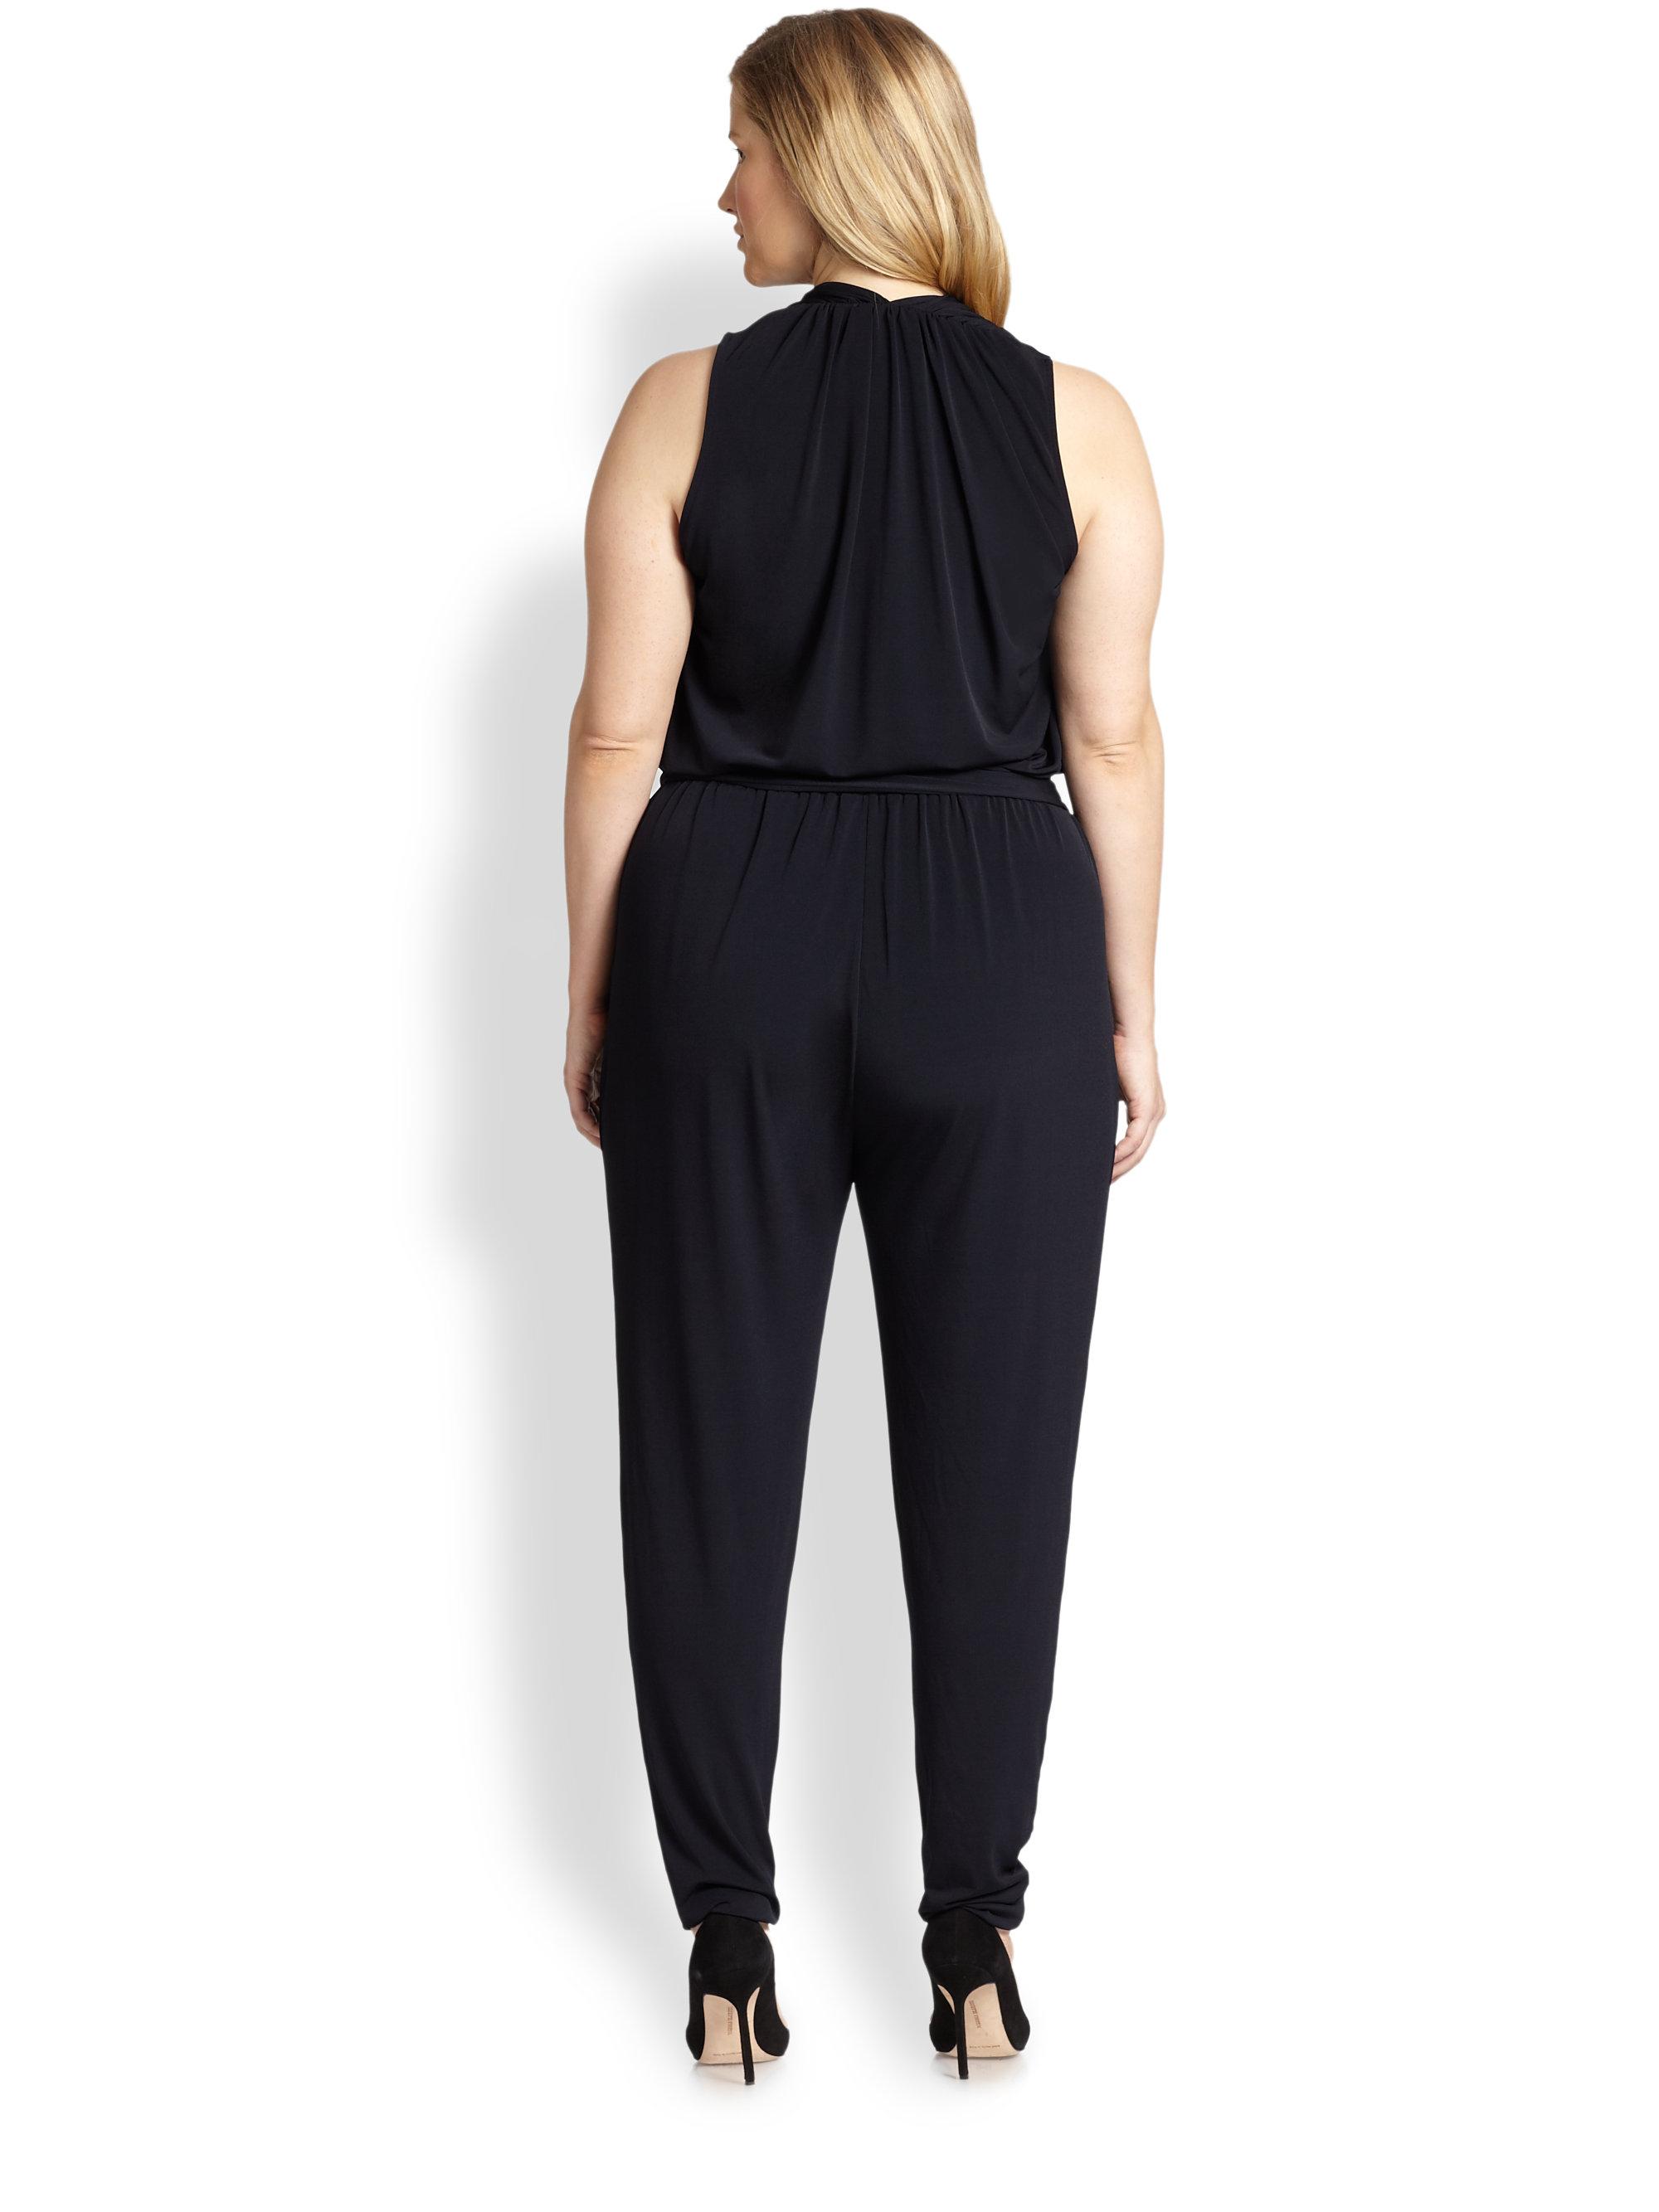 michael michael kors sleeveless selfbelt jumpsuit in black navy lyst. Black Bedroom Furniture Sets. Home Design Ideas